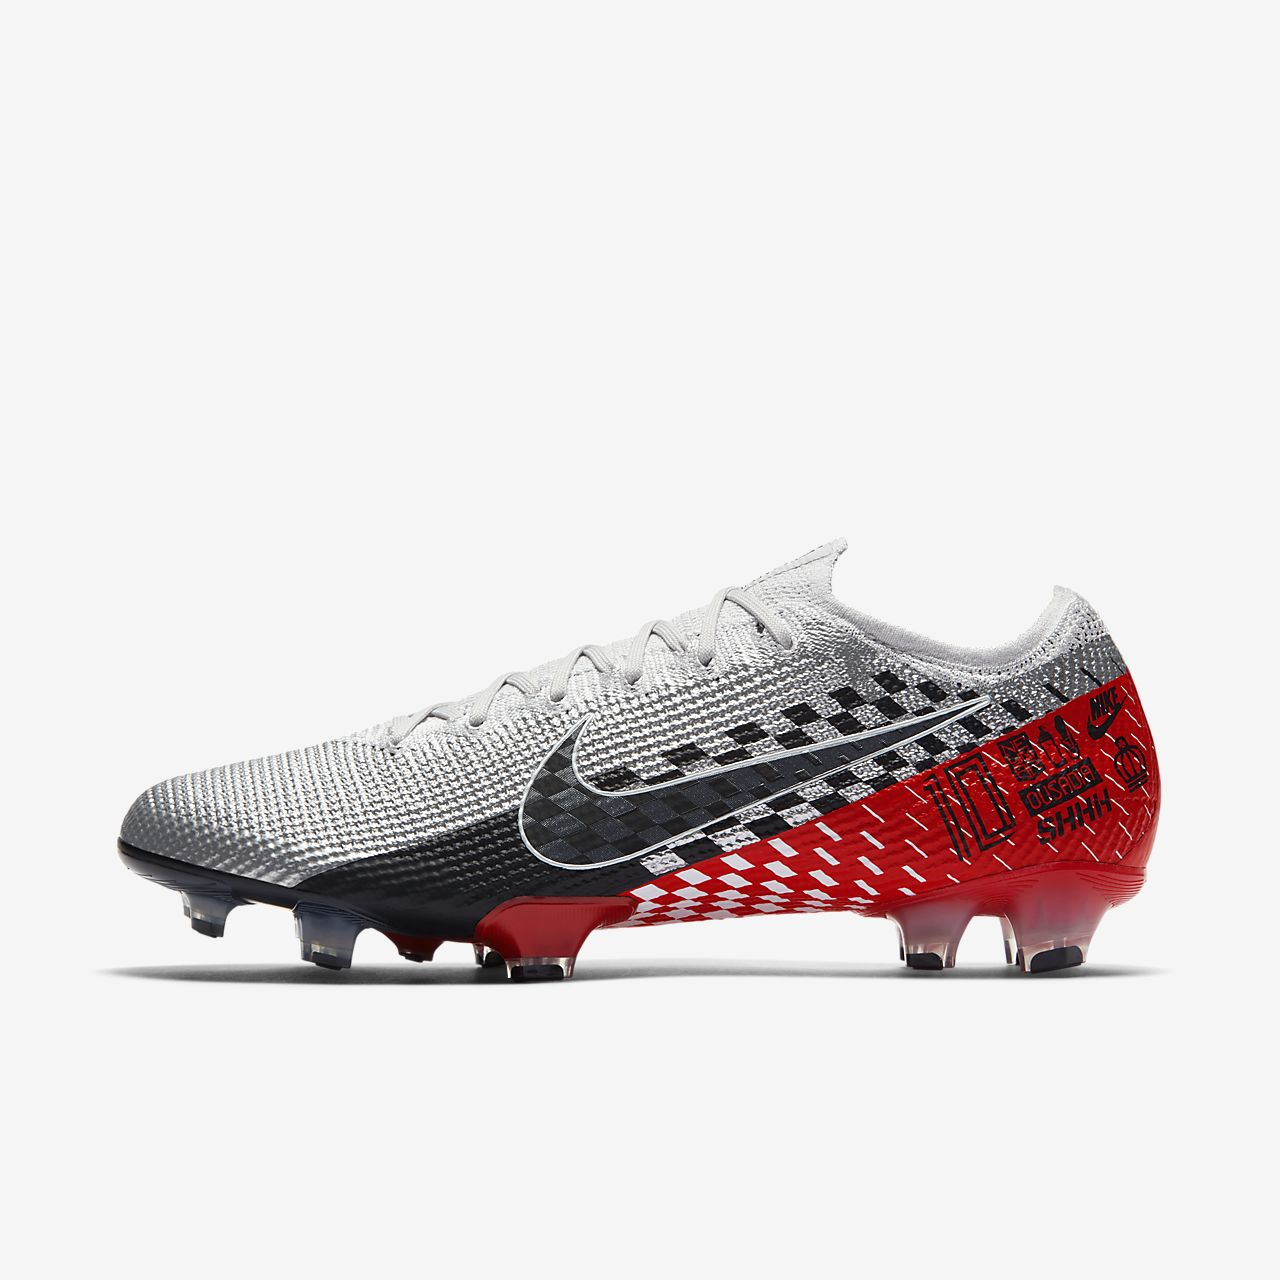 Chaussure Terrain Pour De Elite Sec Neymar JrFg Football Nike Vapor À Mercurial 13 Crampons oCBdxe